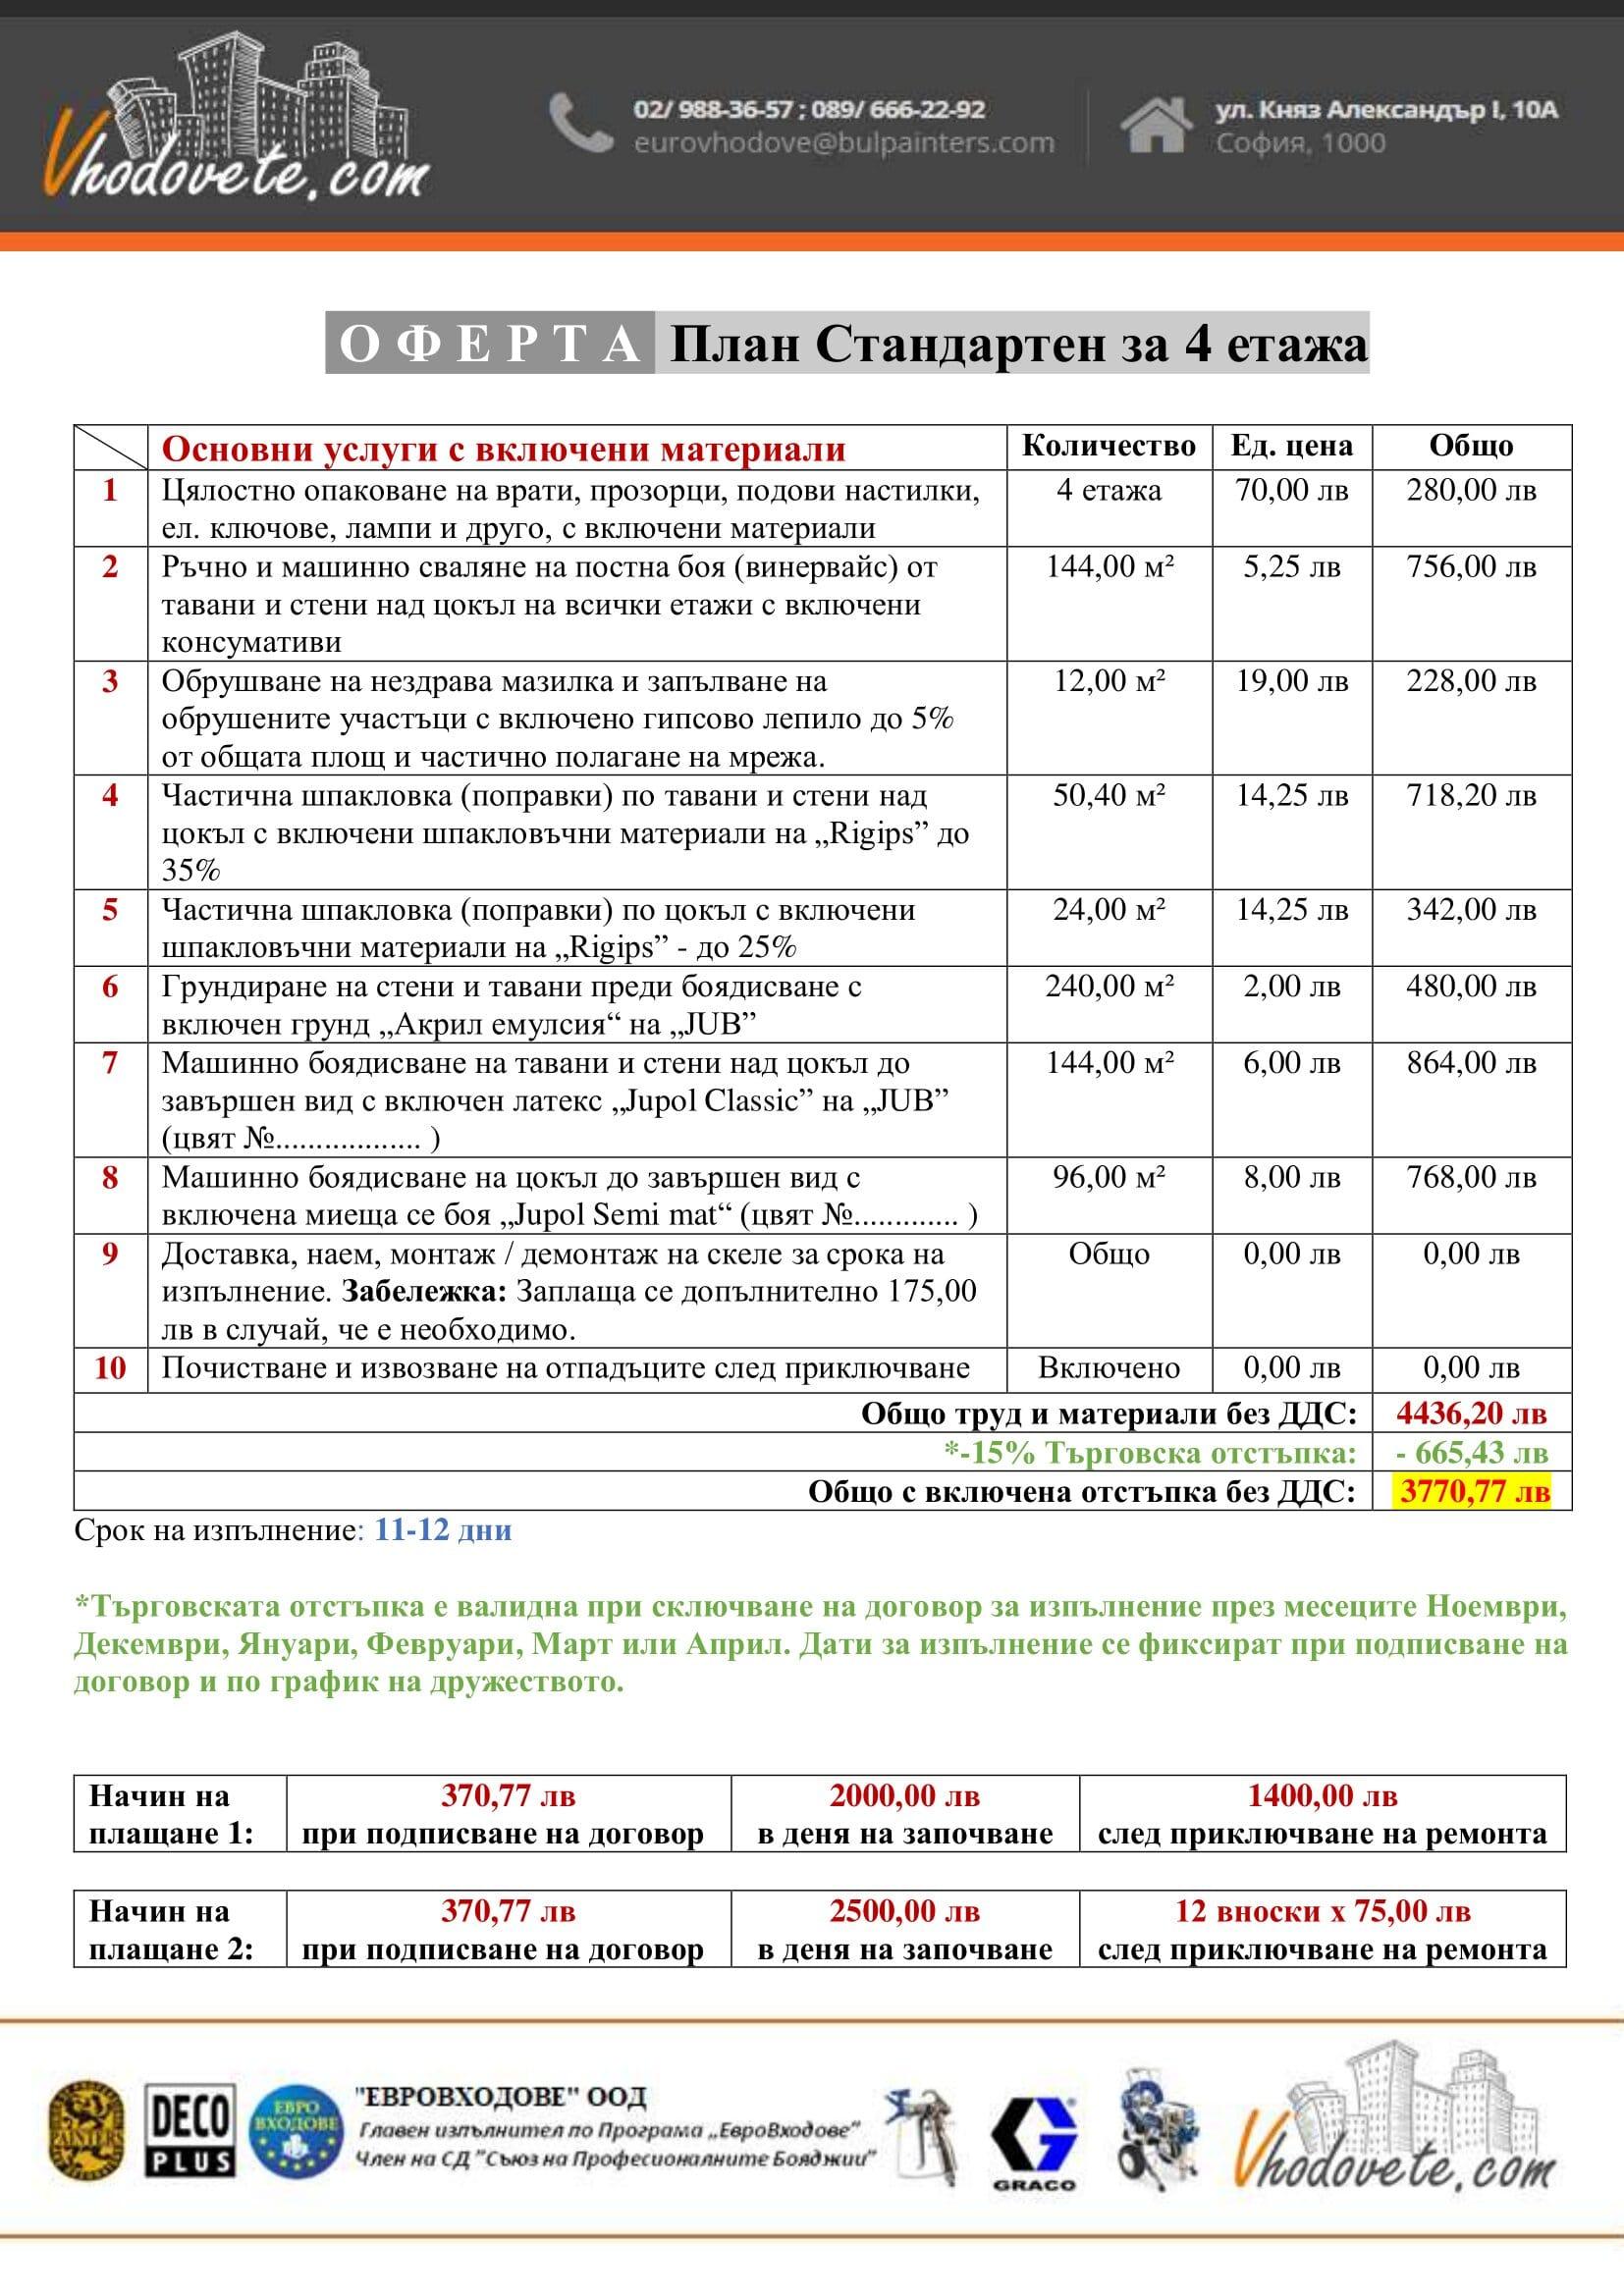 2-Oferta-za-4-et-Standarten-01102020